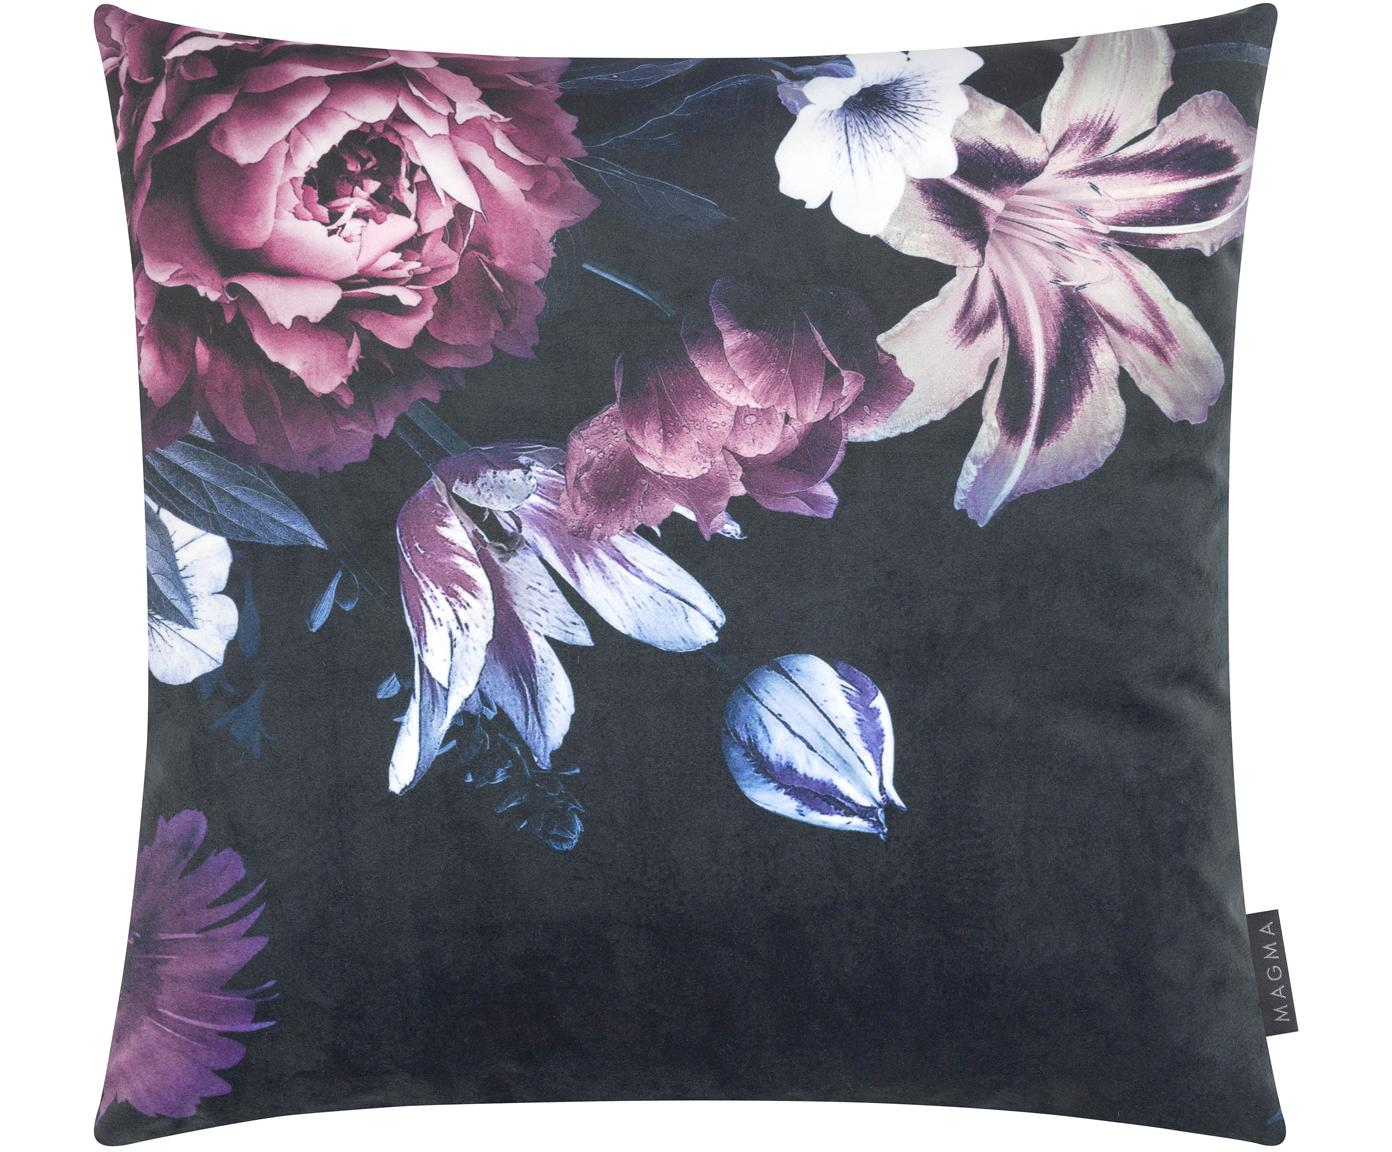 Samt-Kissenhülle Beverly mit dunklem Blumenmuster, Polyestersamt, bedruckt, Schwarz, Mauve, Lila, Rosa, 50 x 50 cm